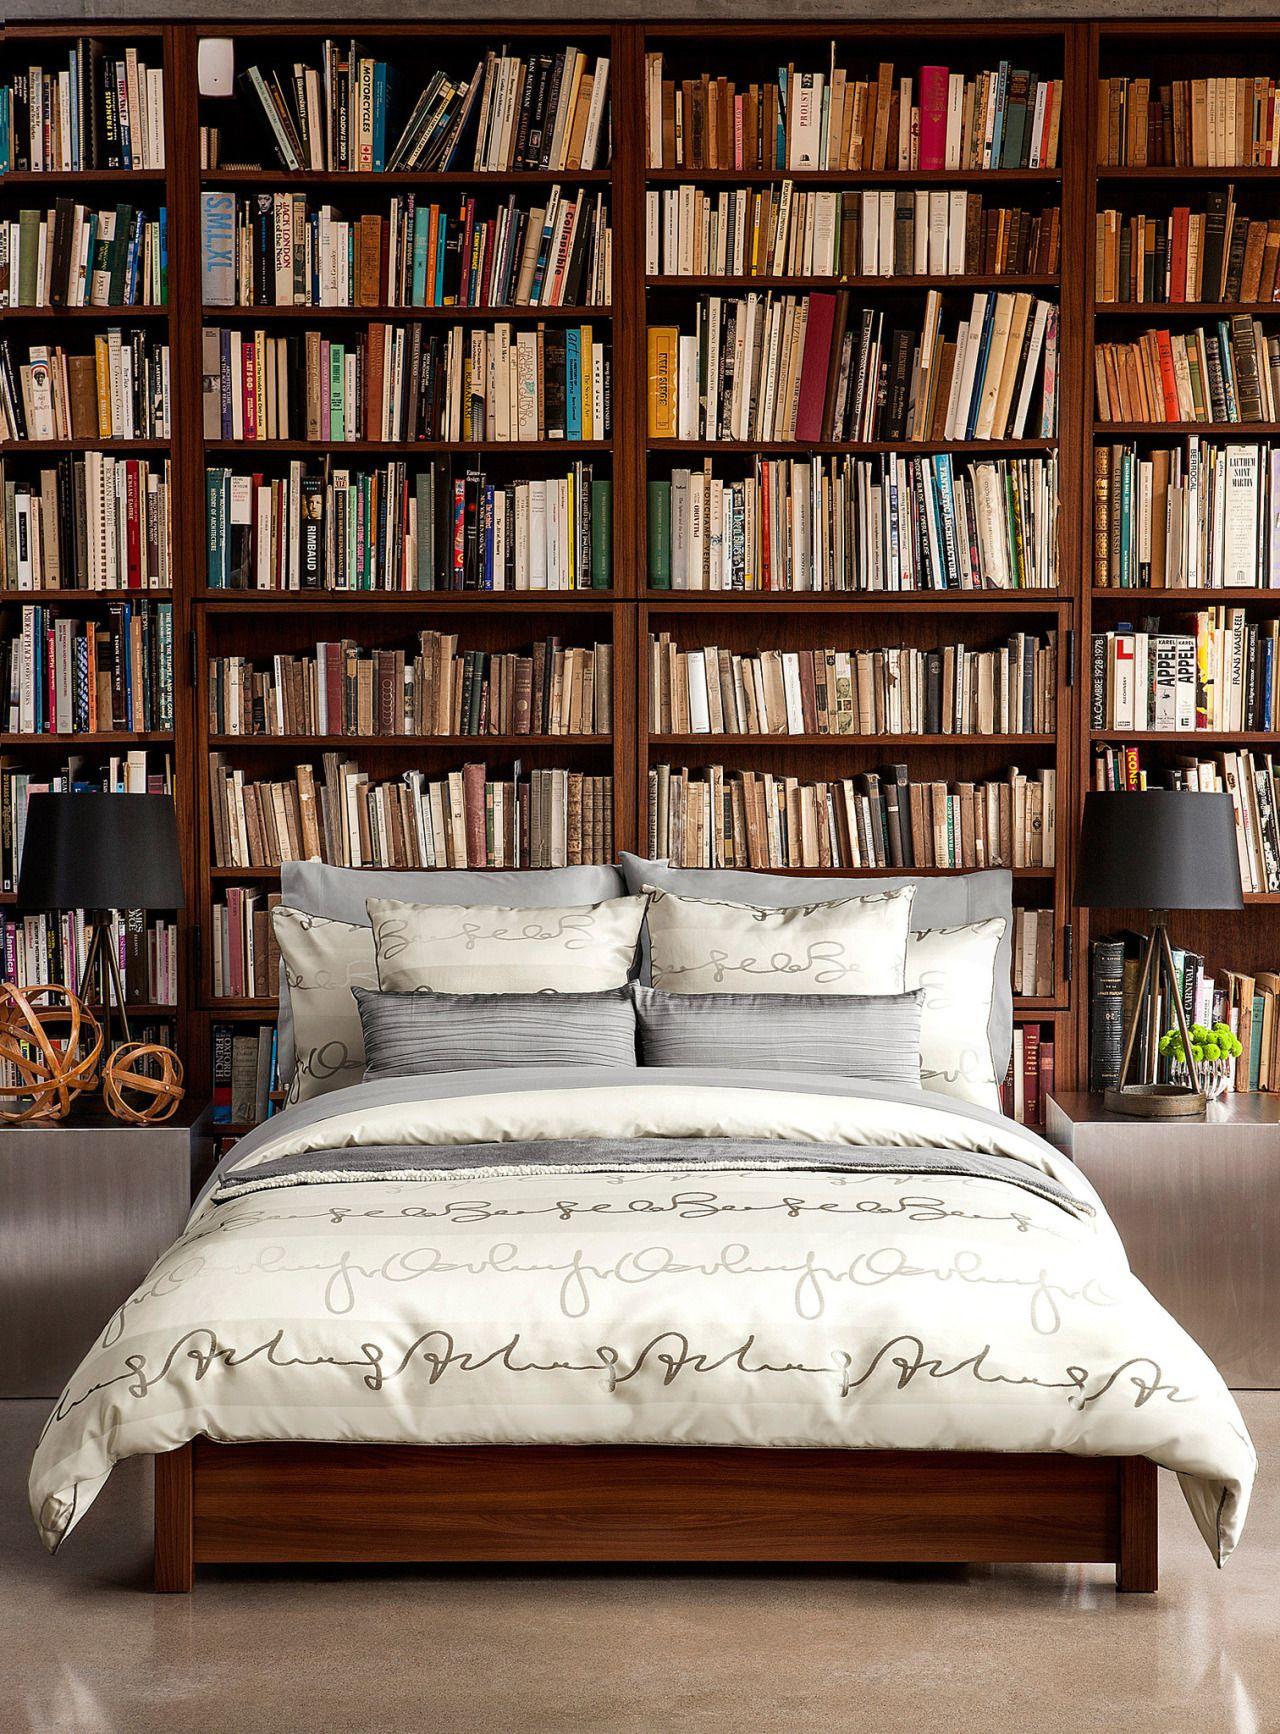 Master bedroom nook  bookshelf porn yes please  Books Bedrooms and Nook